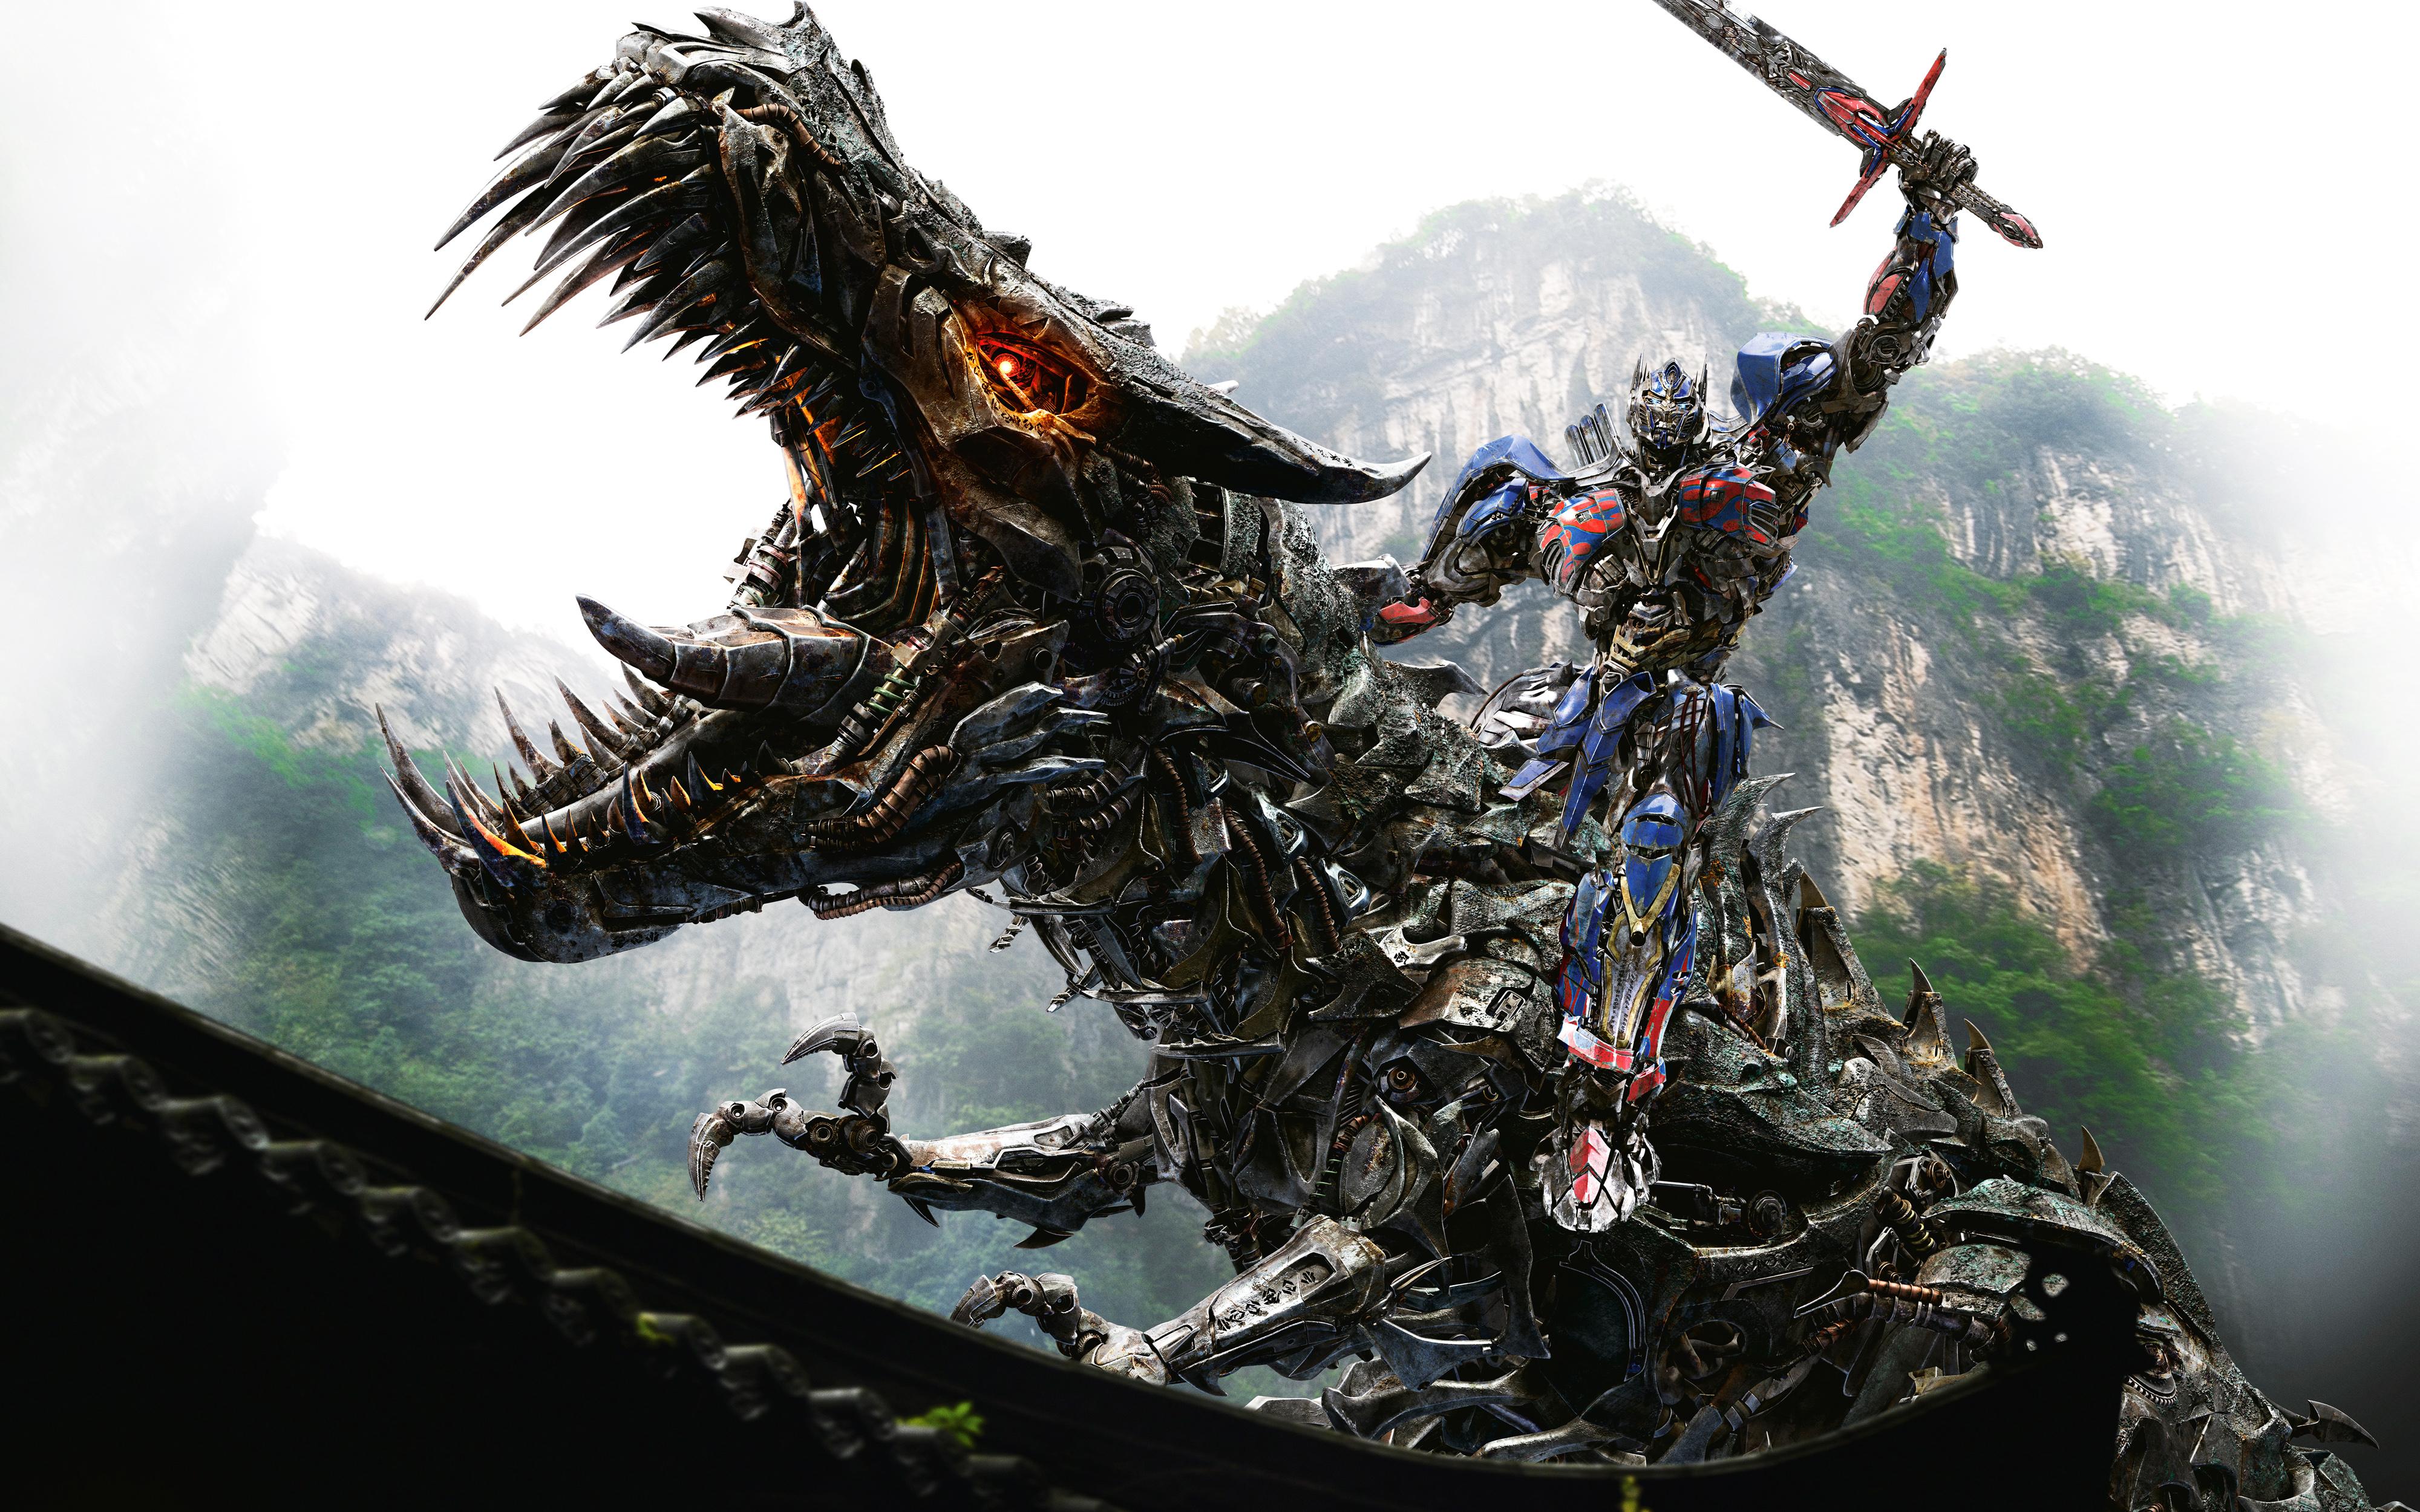 HD Wallpapers Optimus Prime on Dinobot